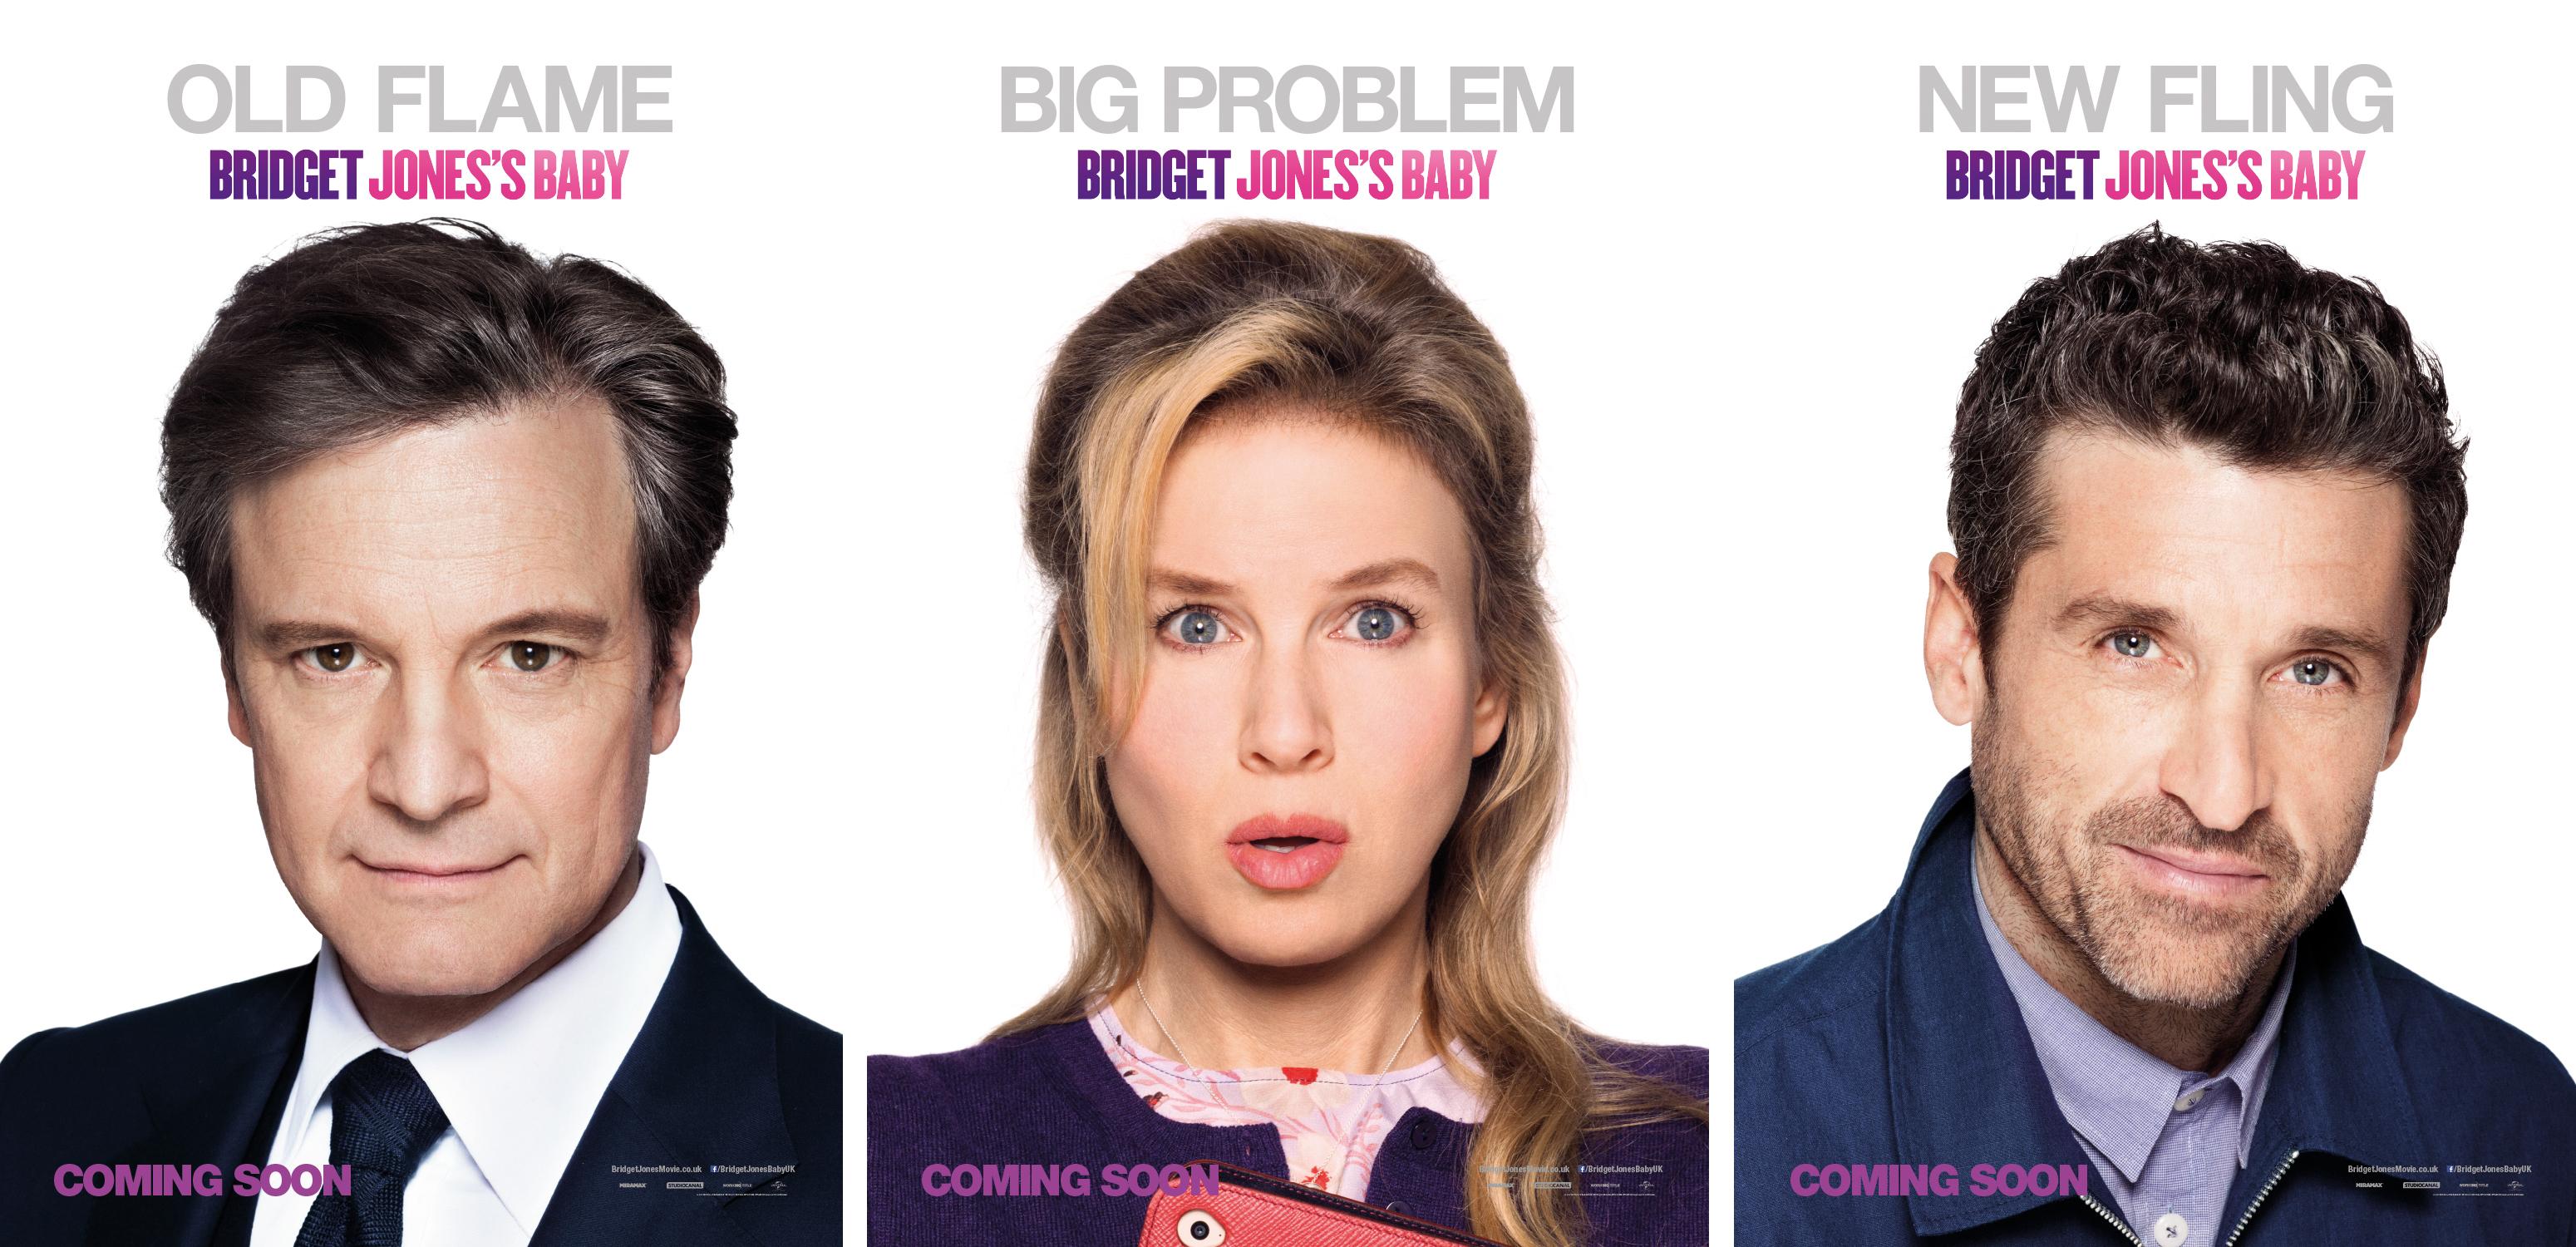 Bridget Jone's Baby character posters